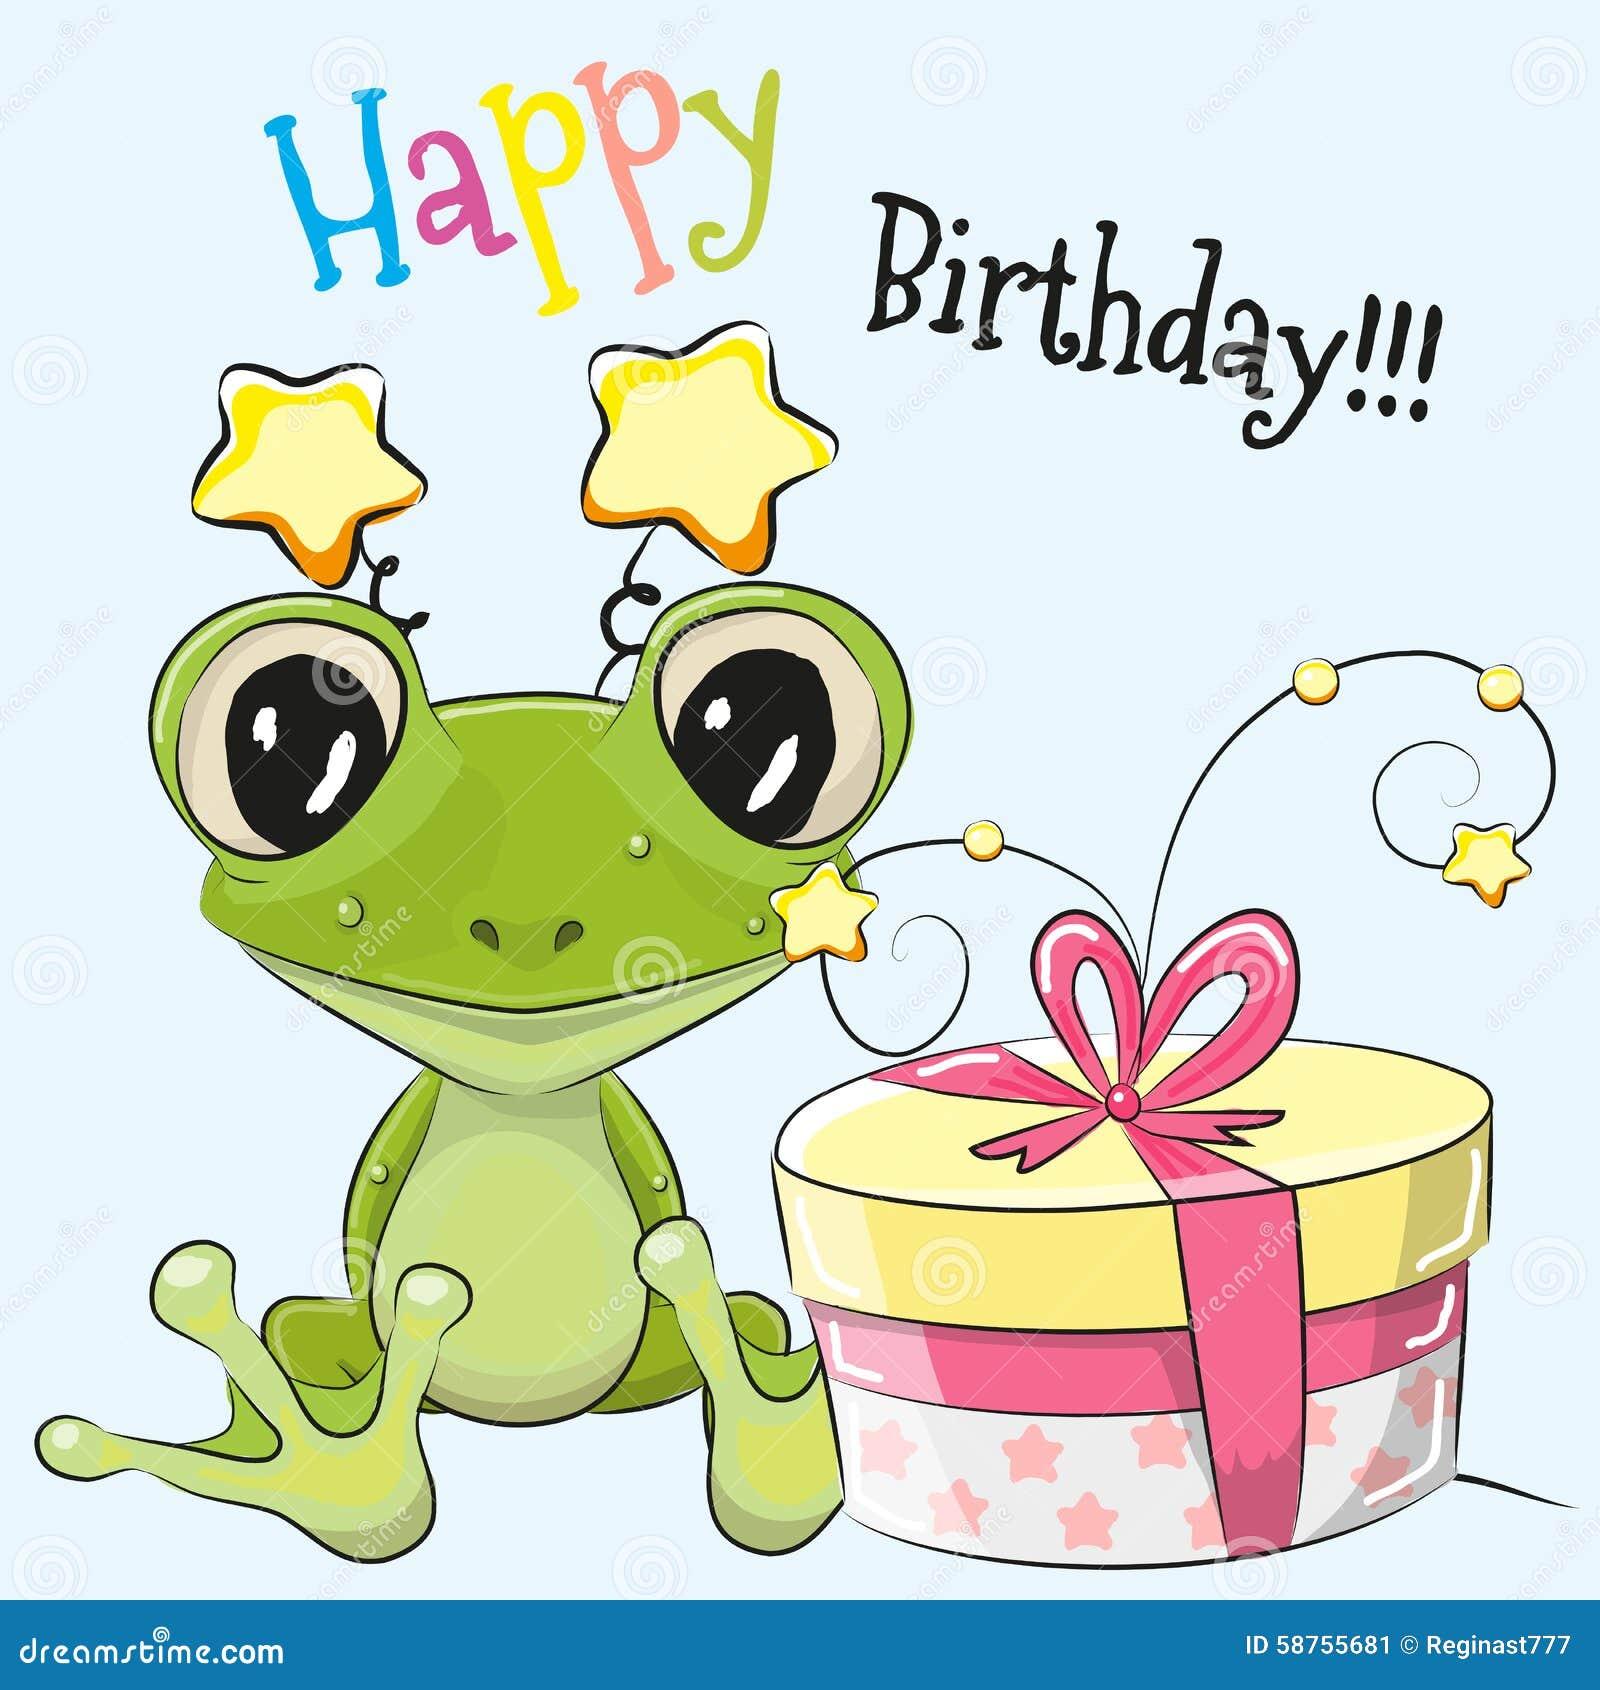 Regalo de cumple birthday gift - 2 part 8